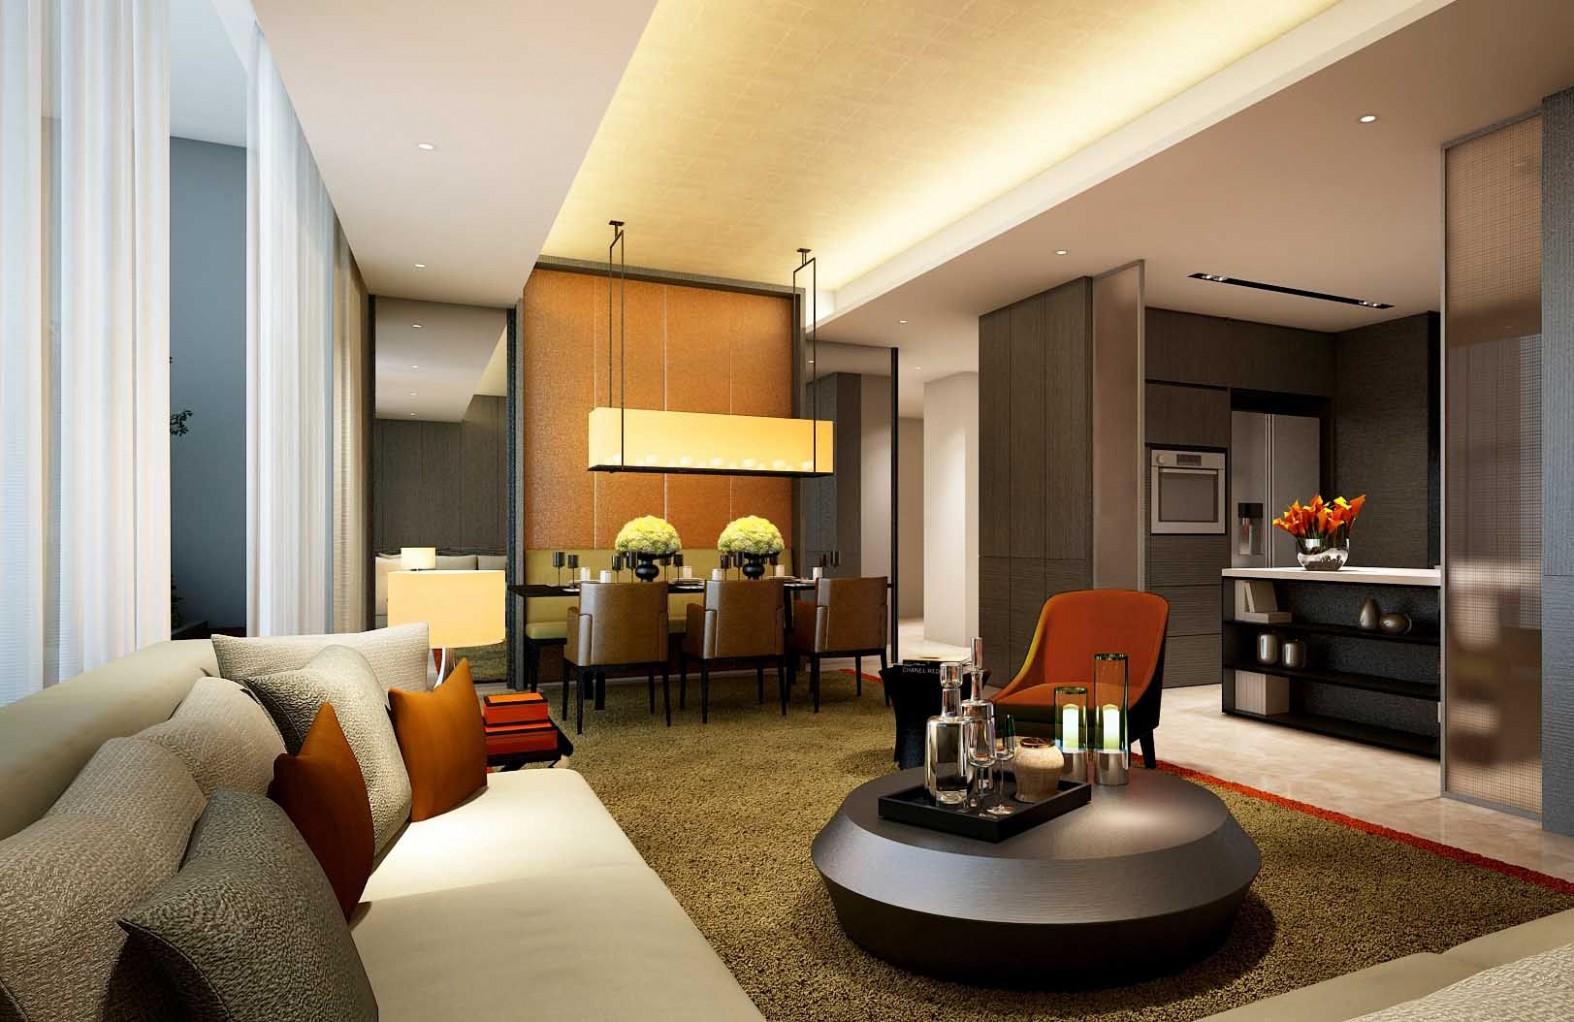 SCDA GCMN Apartments, Jakarta, Indonesia  Apartment design  - Apartment Interior Design Jakarta